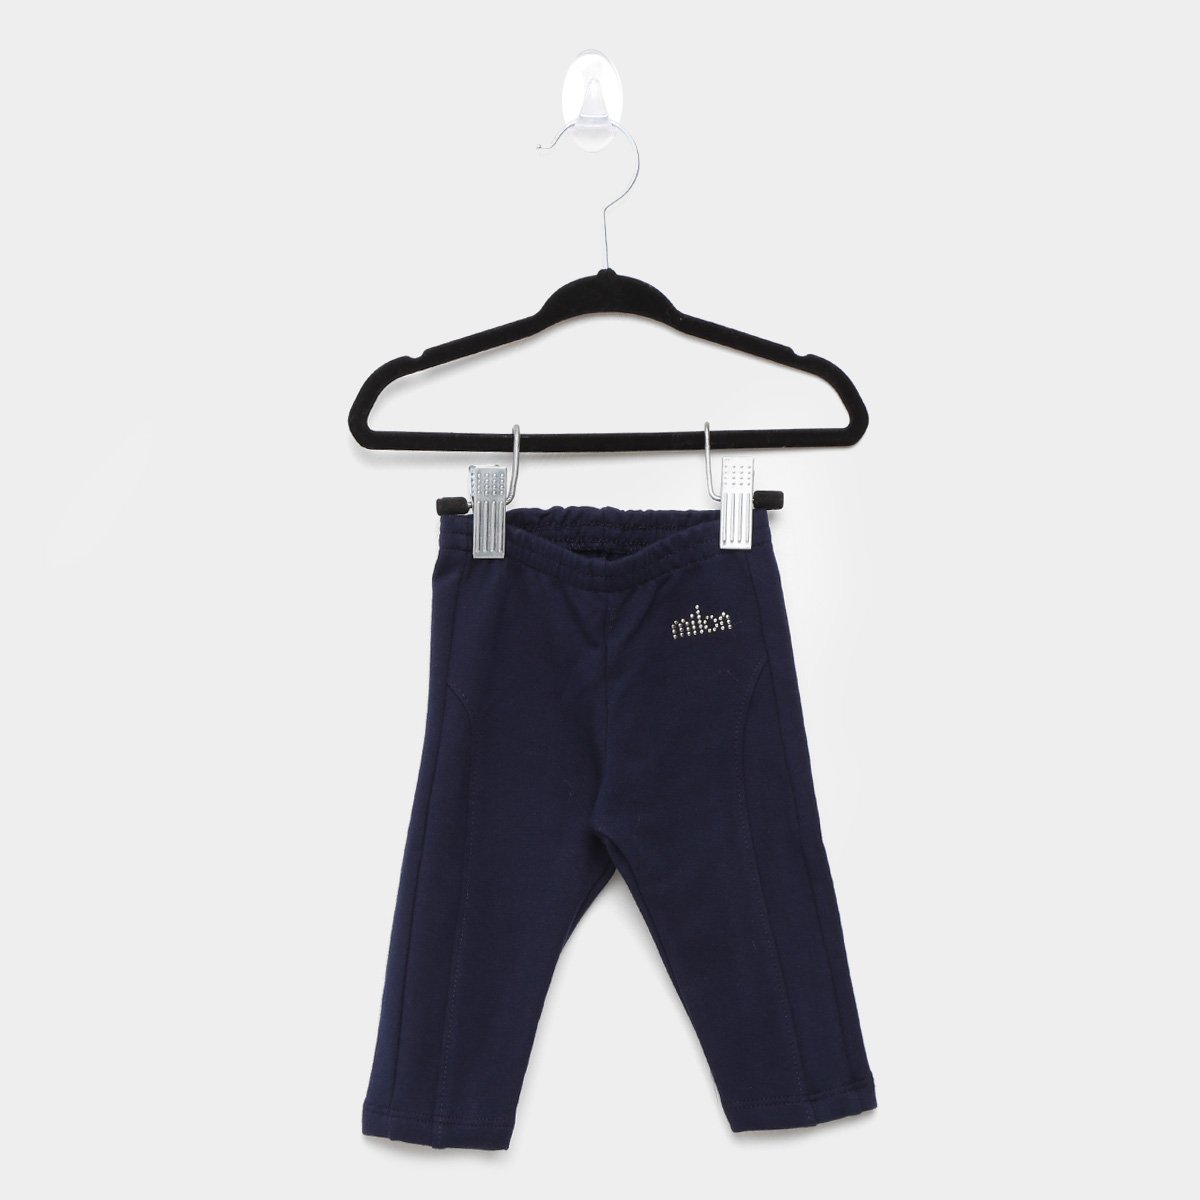 Calça Legging Infantil Milon Molicotton Baby